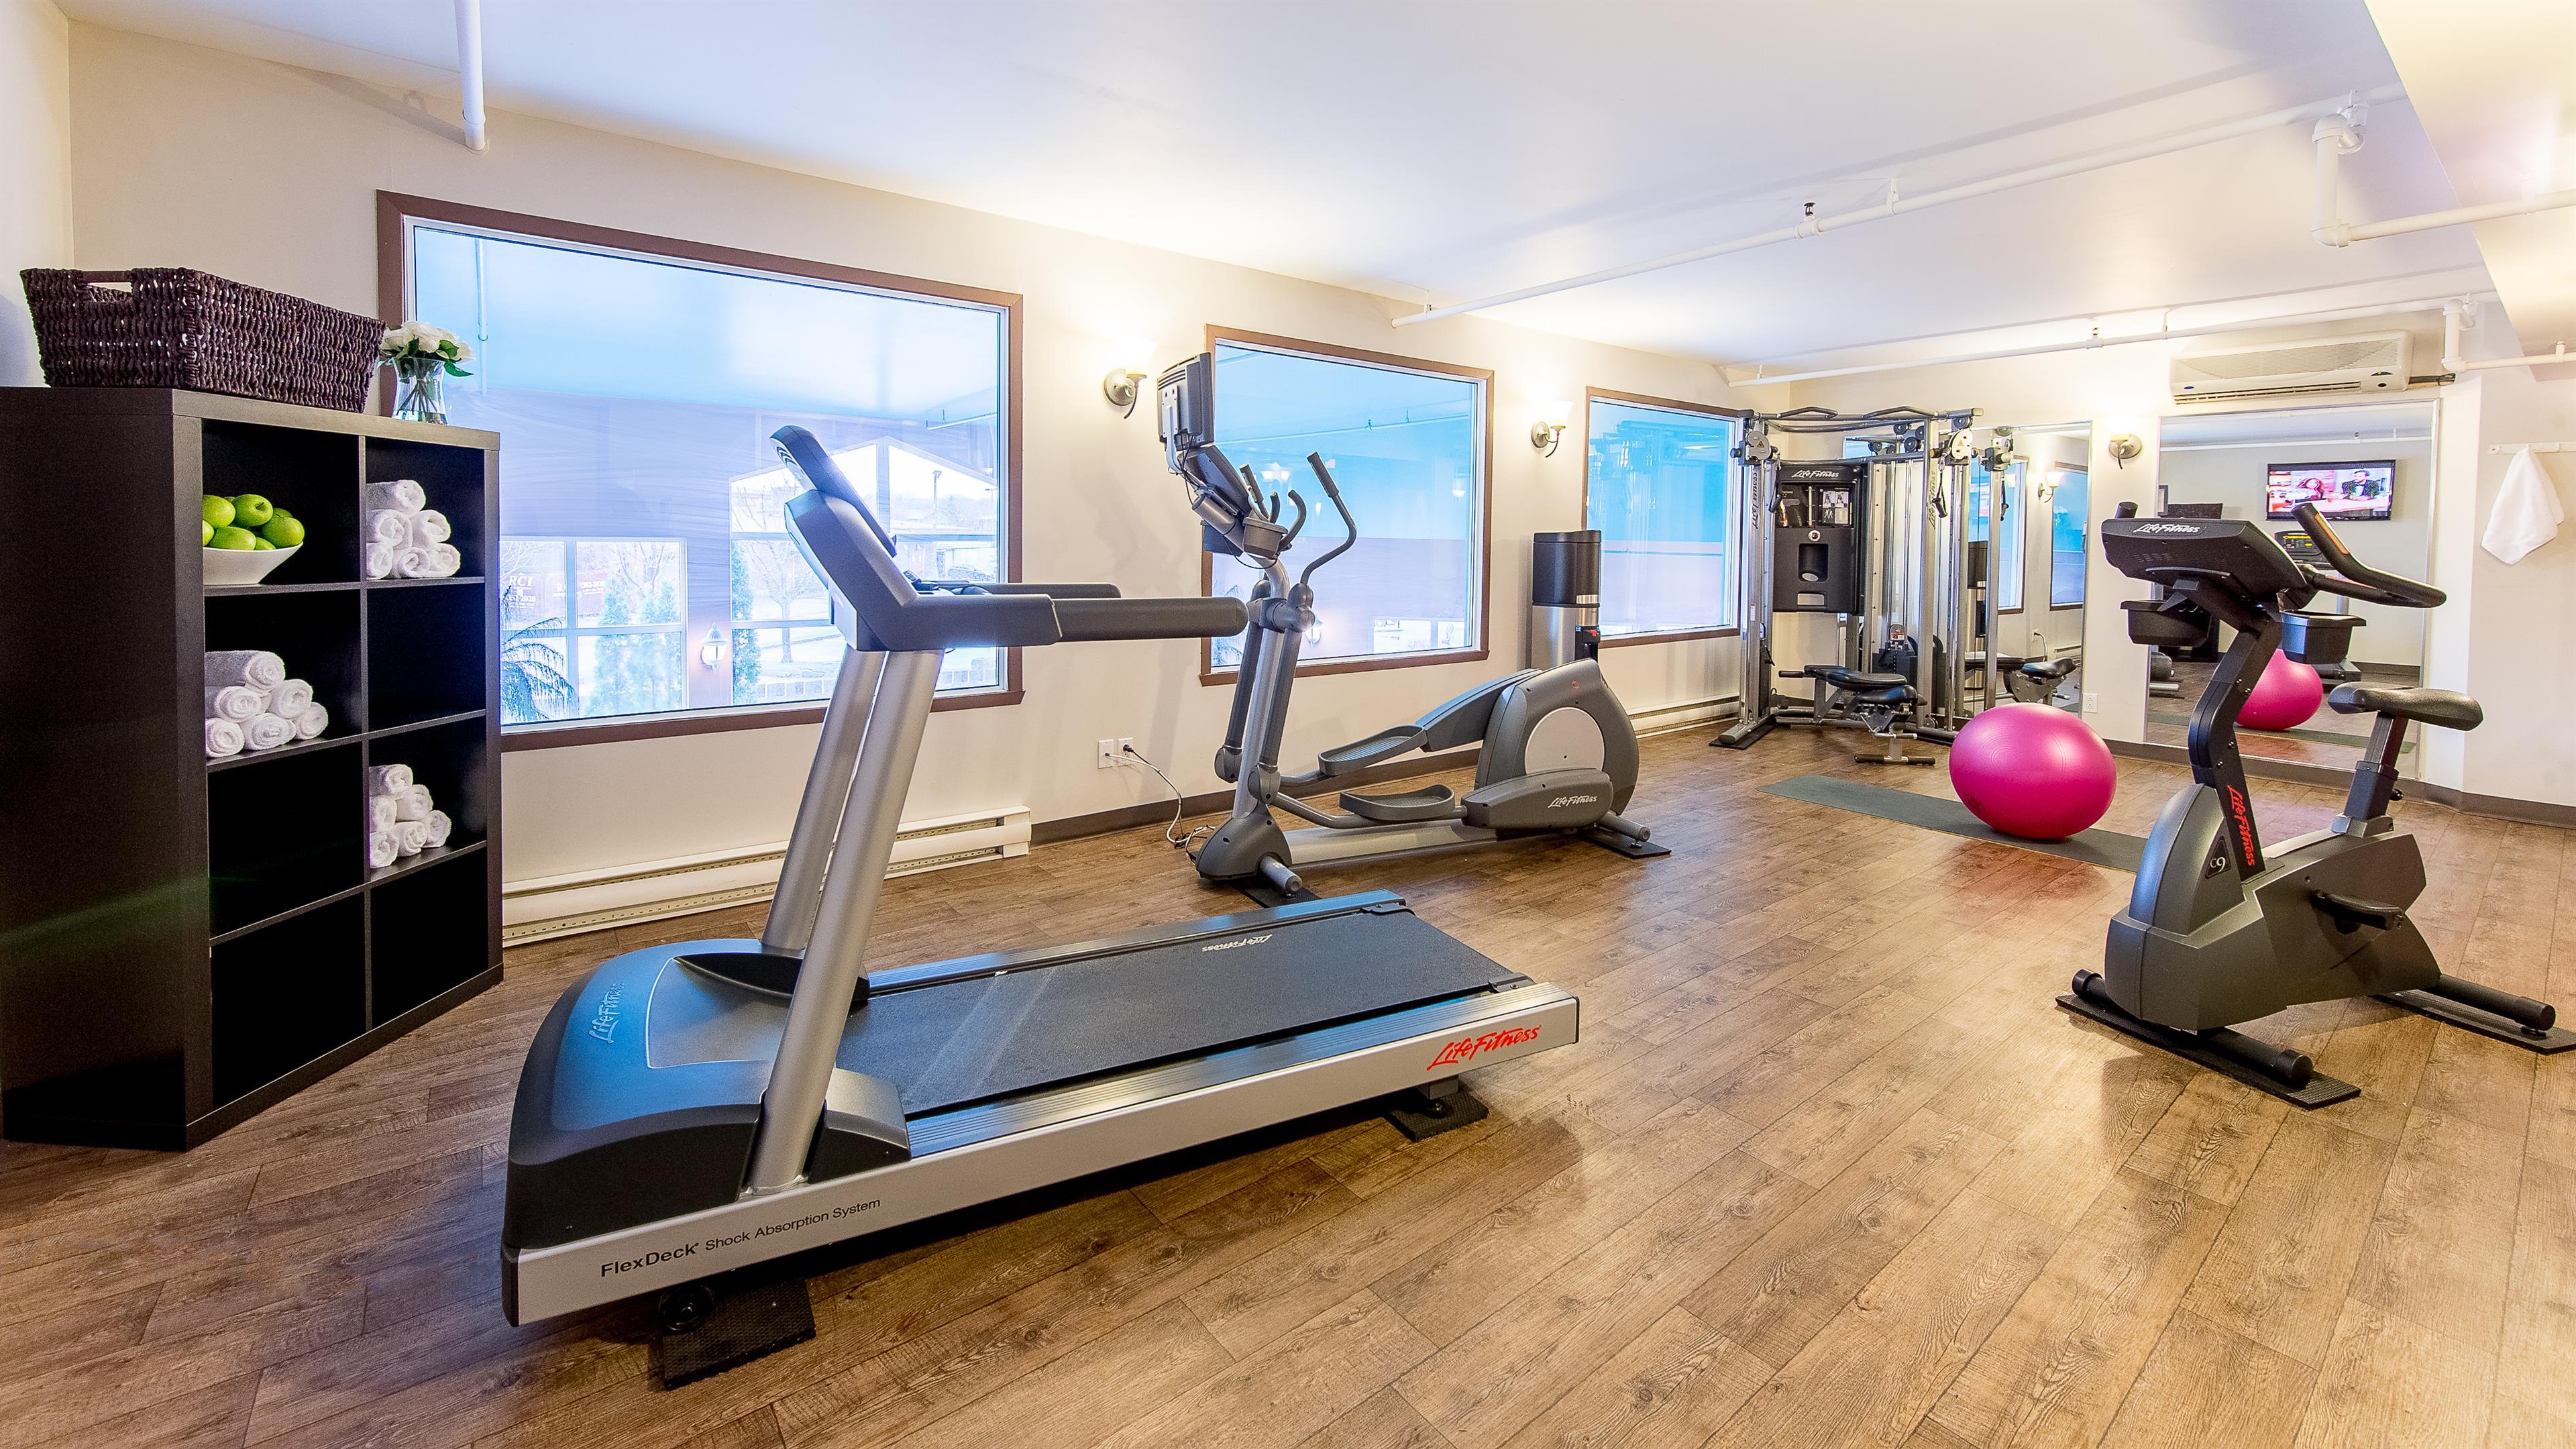 Best Western Hotel Brossard à Brossard: Fitness Center